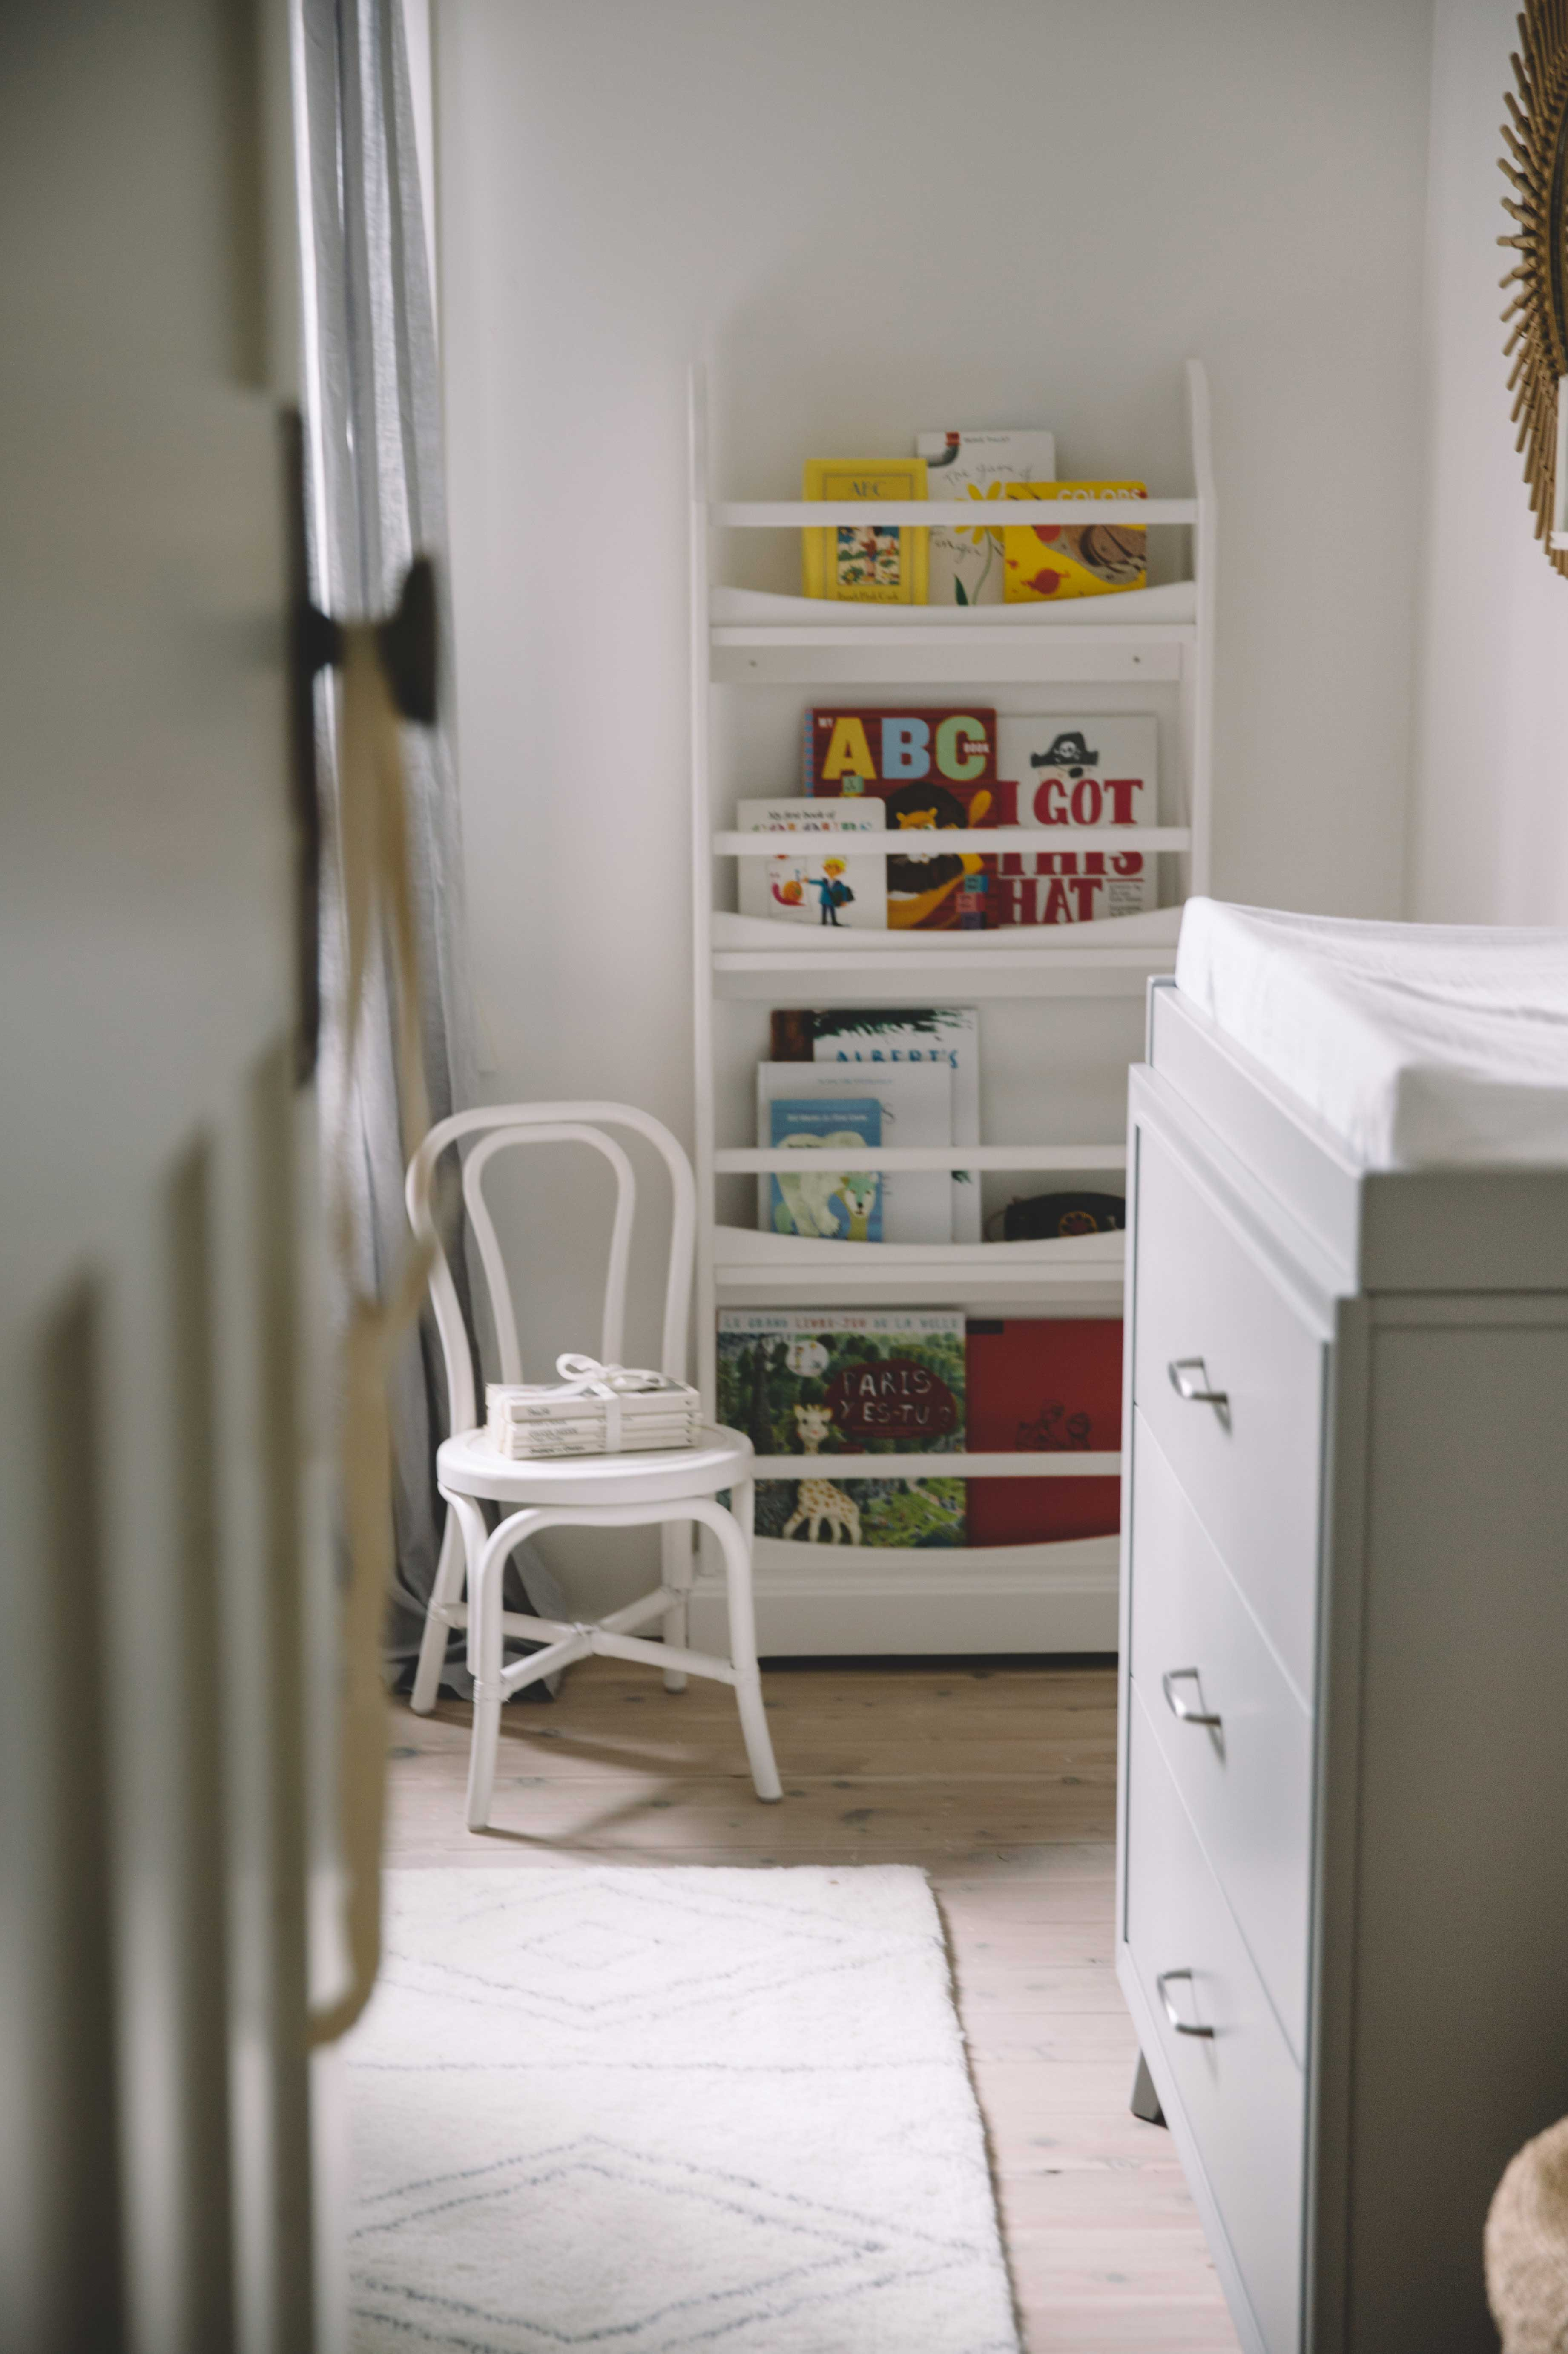 pictures barn ideas bedroom barns living bedrooms king sets room blog kids images of pottery full set fillmore